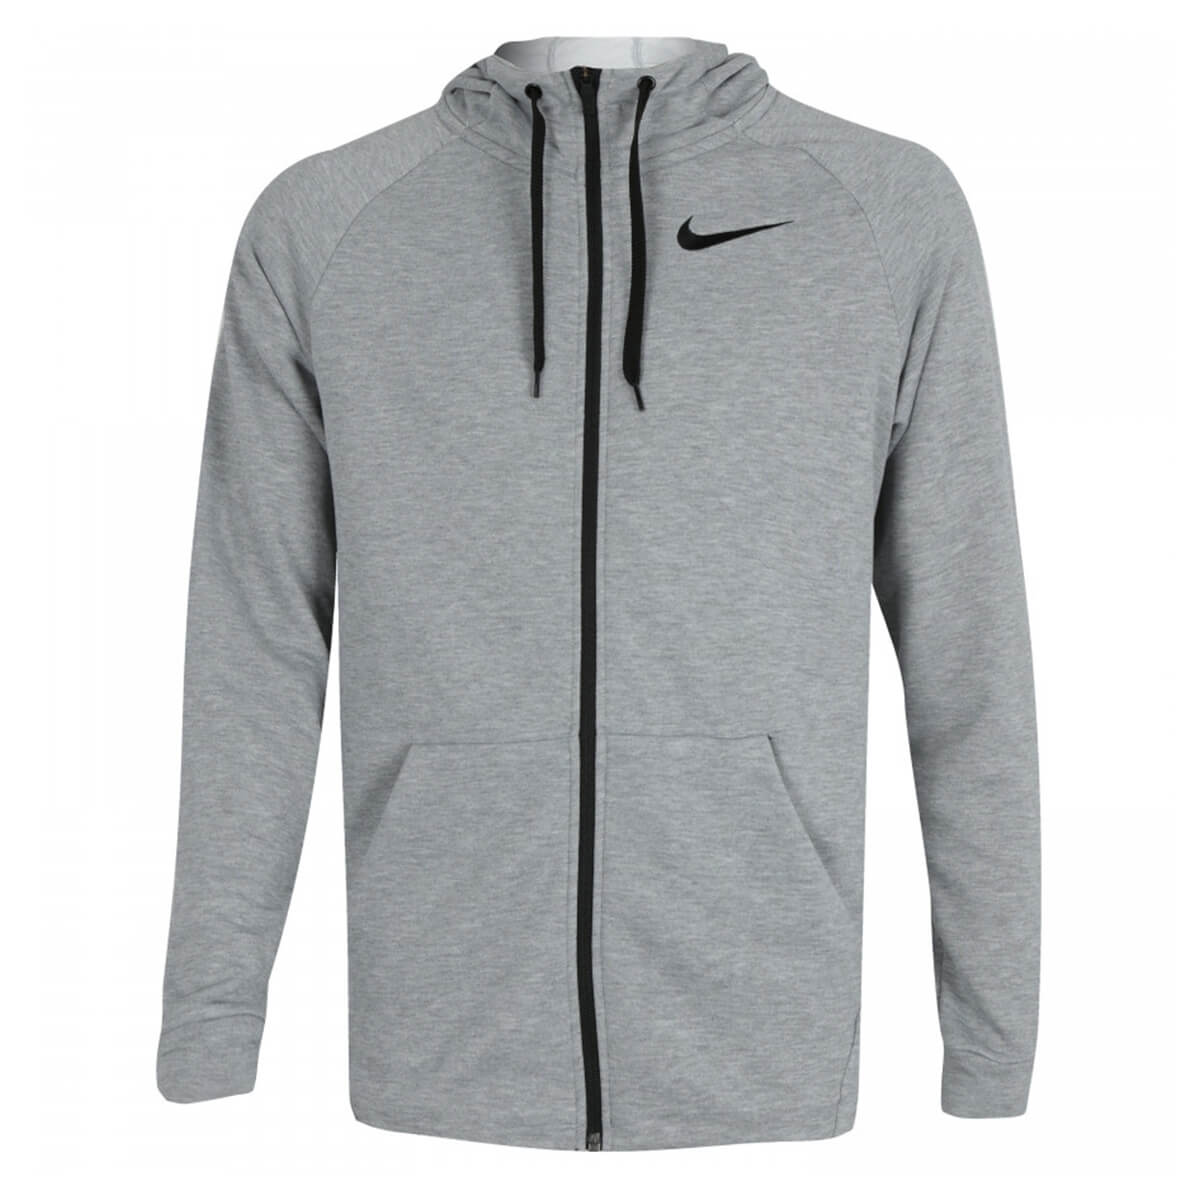 Jaqueta Nike Dri-Fit - Cinza - Masculina